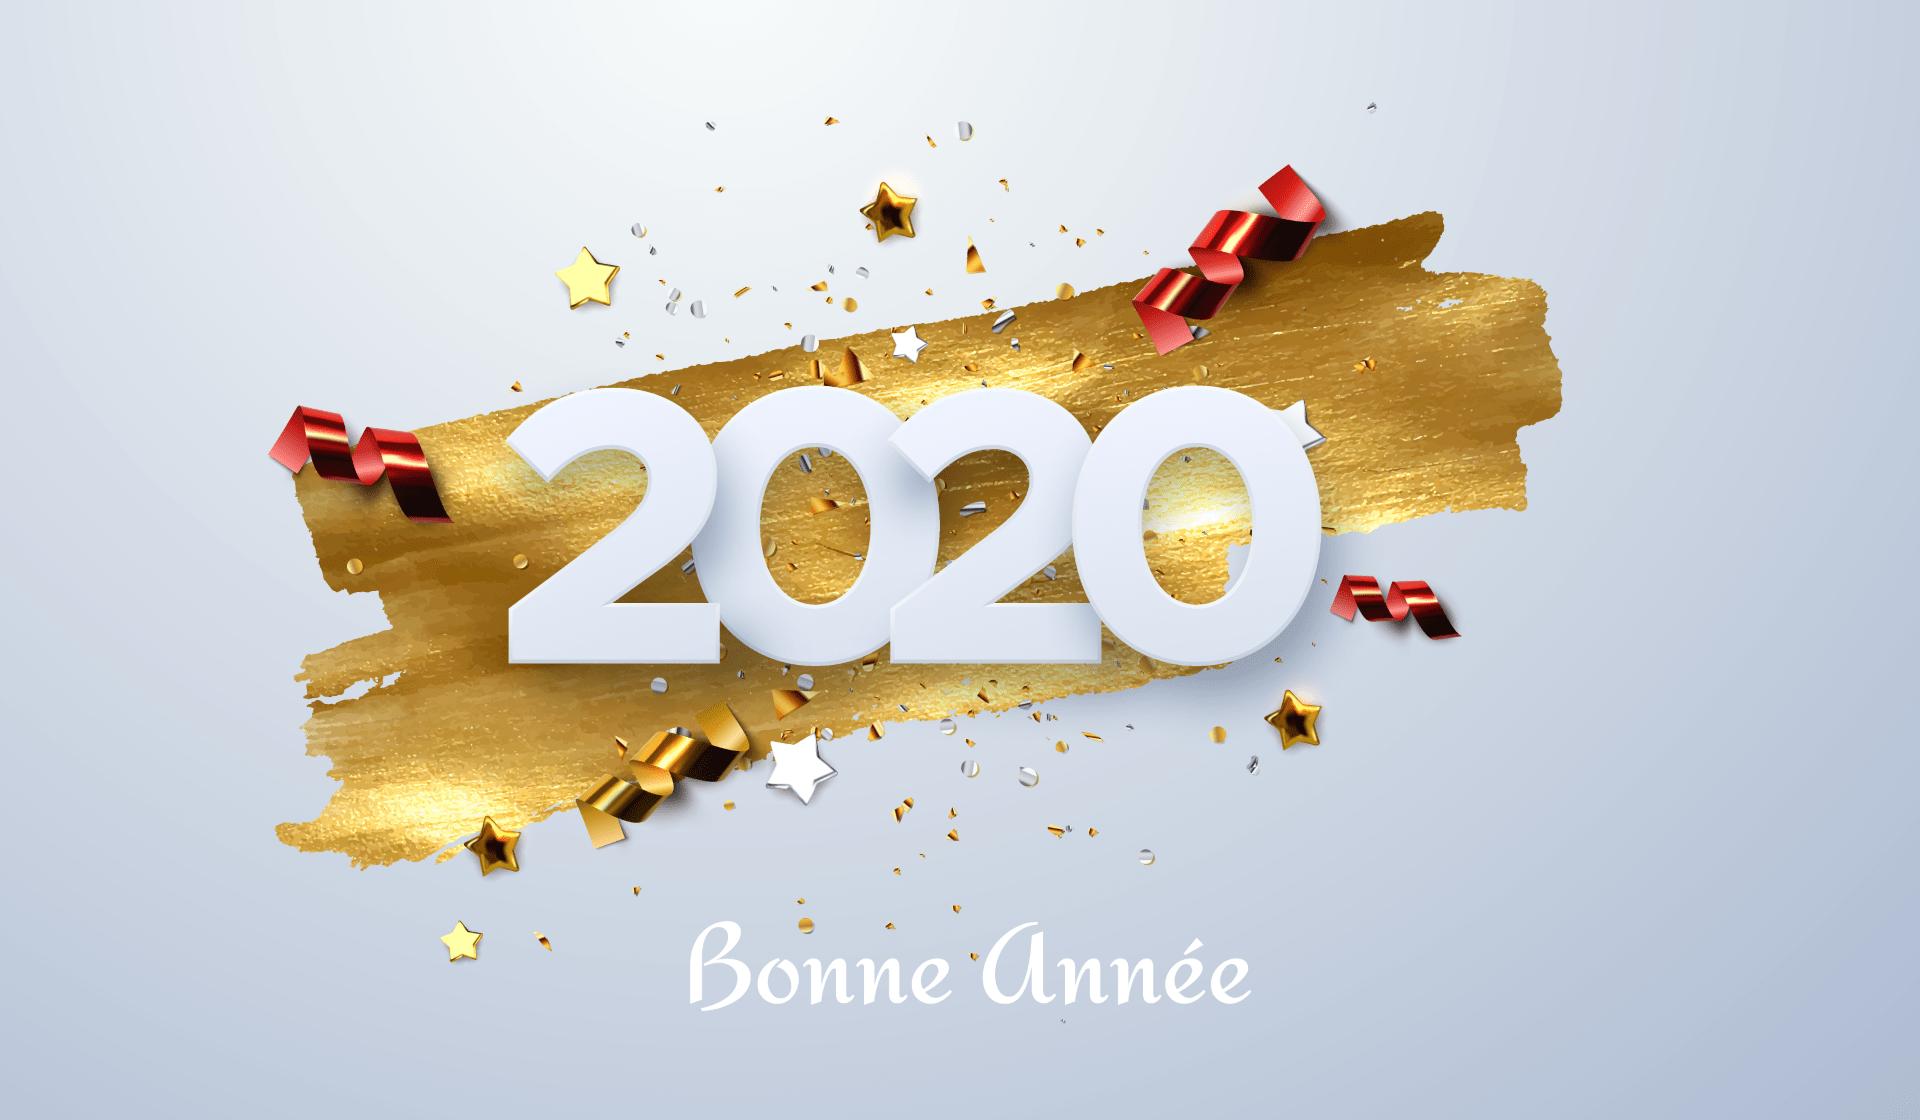 bonne annee 2020 a la vallee des korrigans